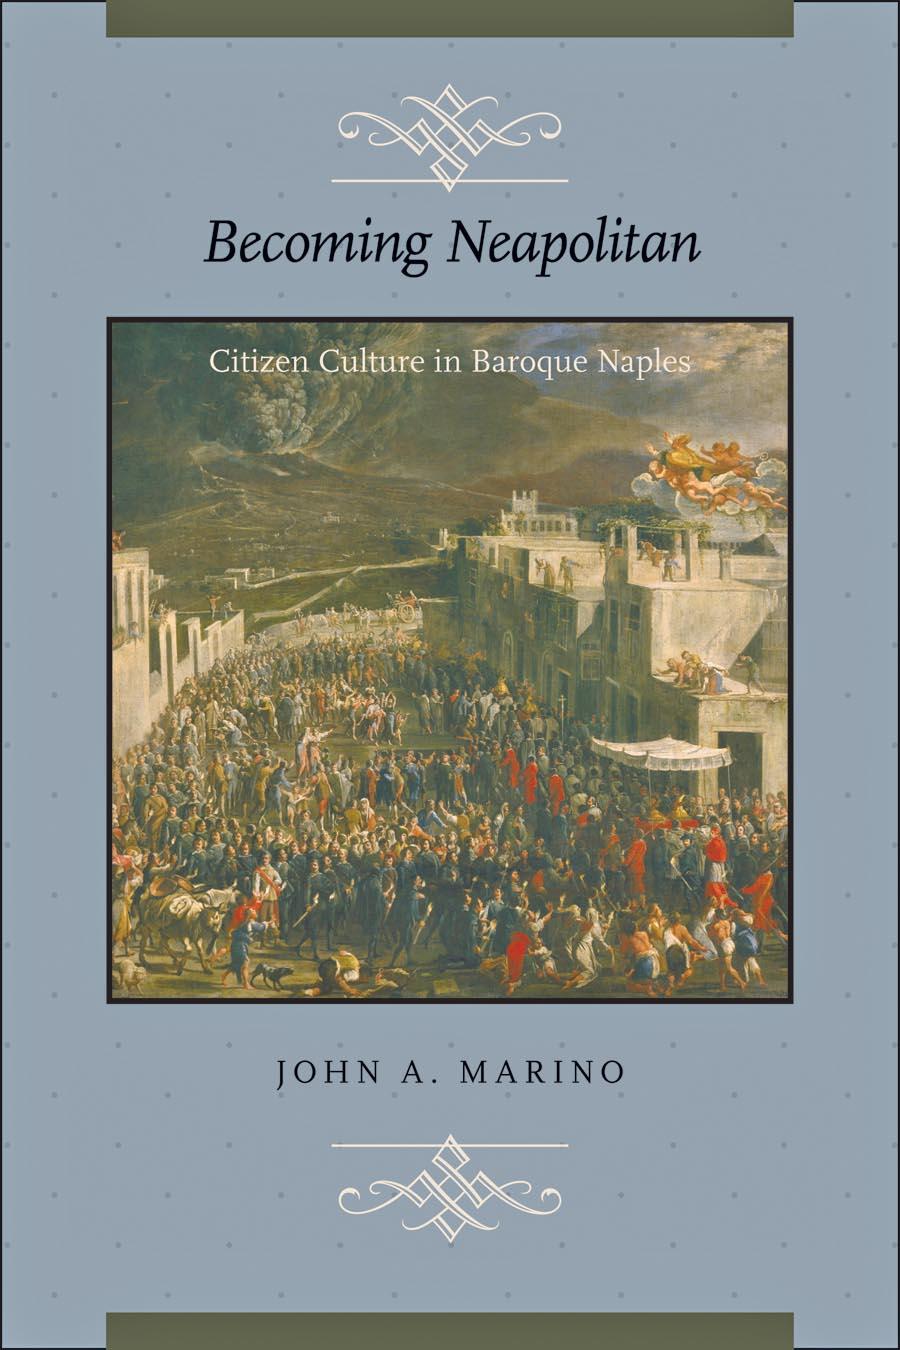 цена на Becoming Neapolitan – Citizen Culture in Baroque Naples